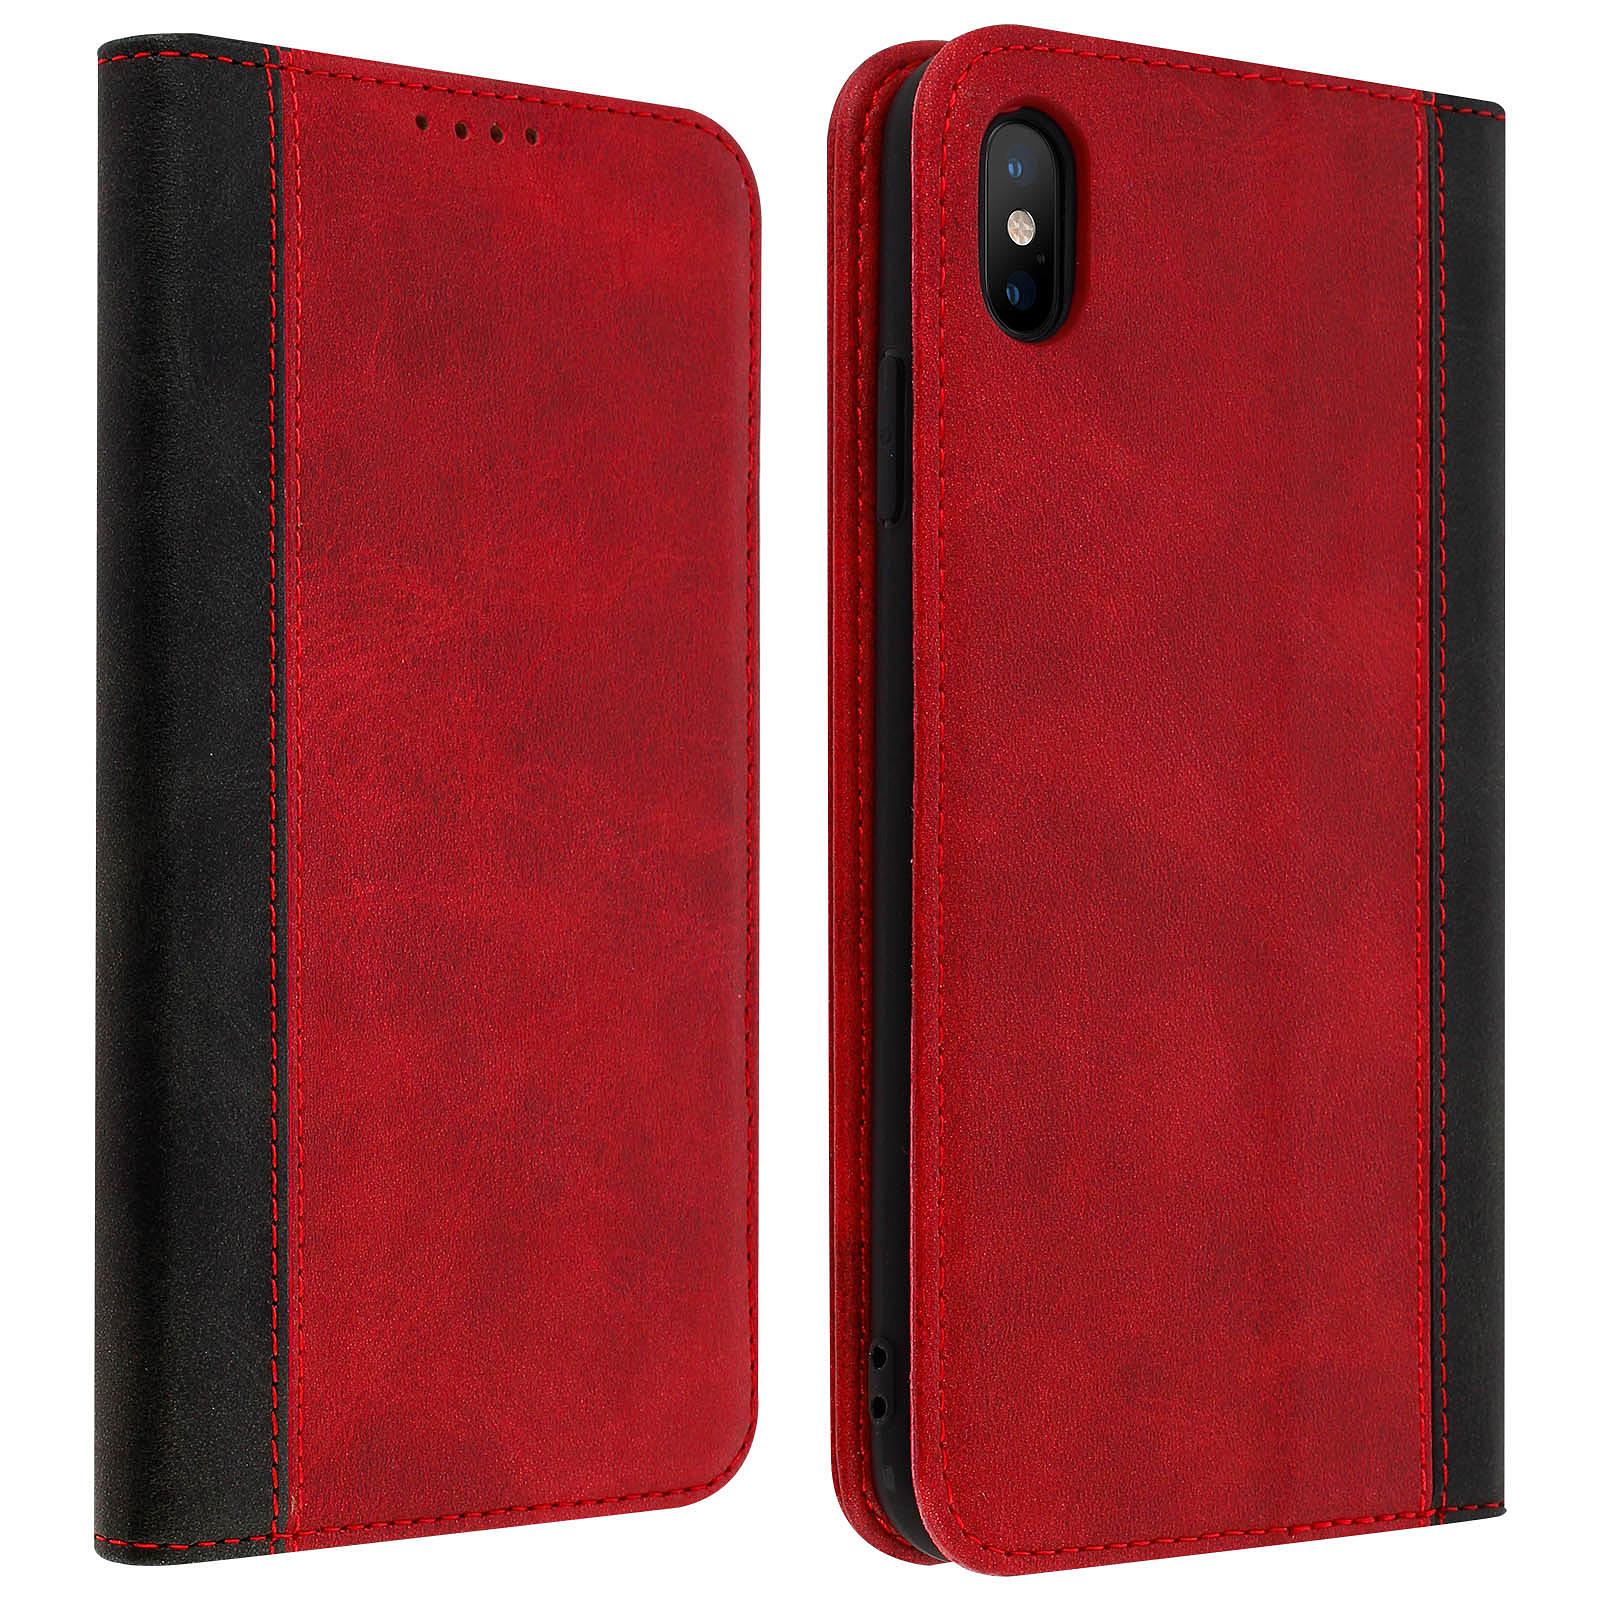 Avizar Etui folio Rouge Éco-cuir pour Apple iPhone XS Max